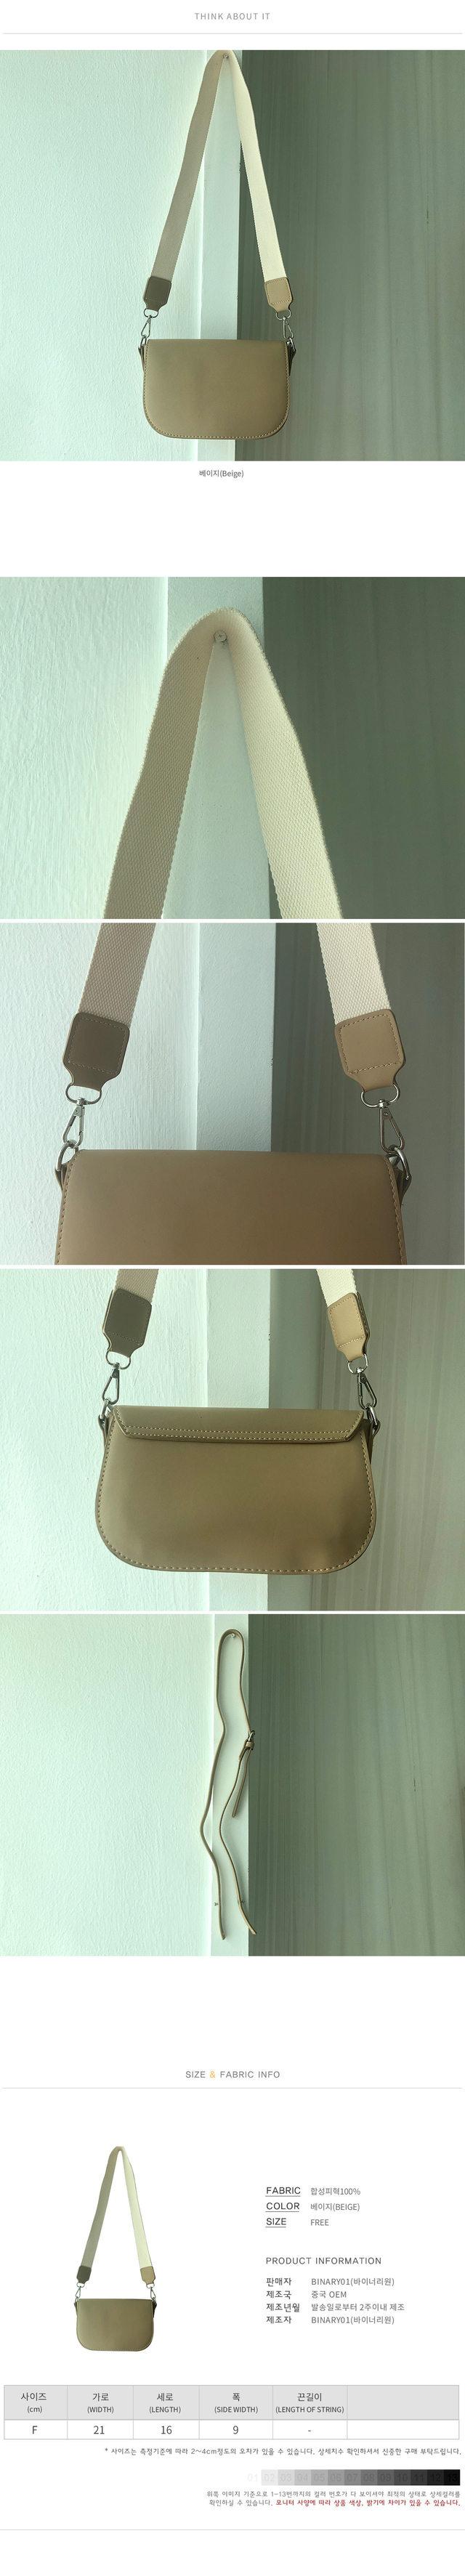 Beater Cross Bag